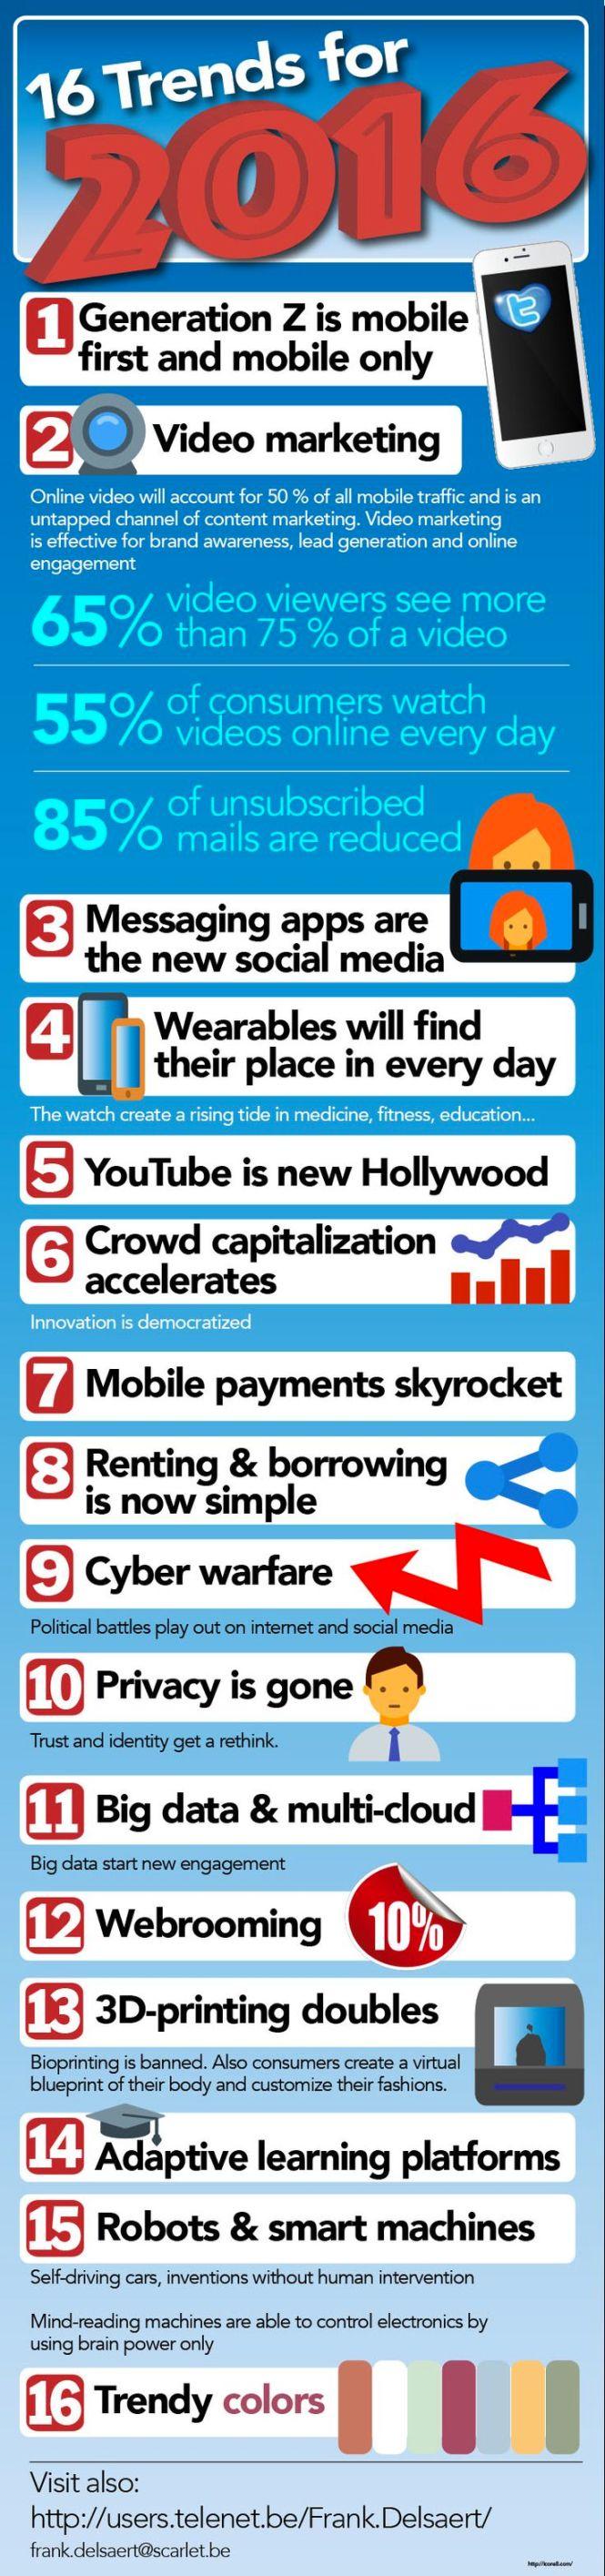 digital trend 2016 - 2